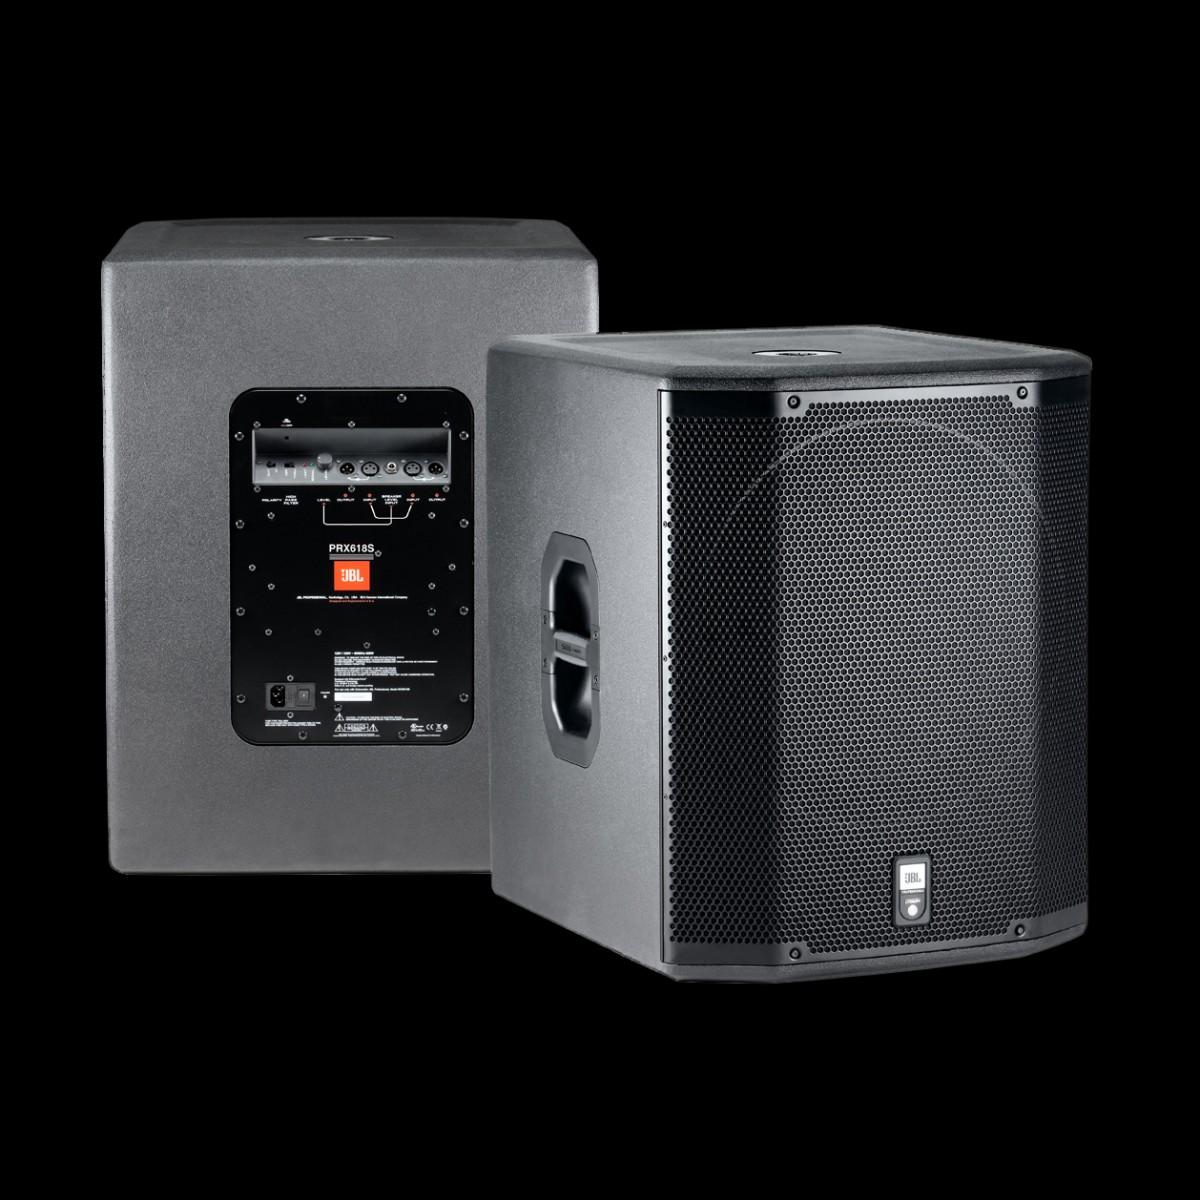 jbl prx 600 prx618 s grille voor luidsprekerhoes baseline